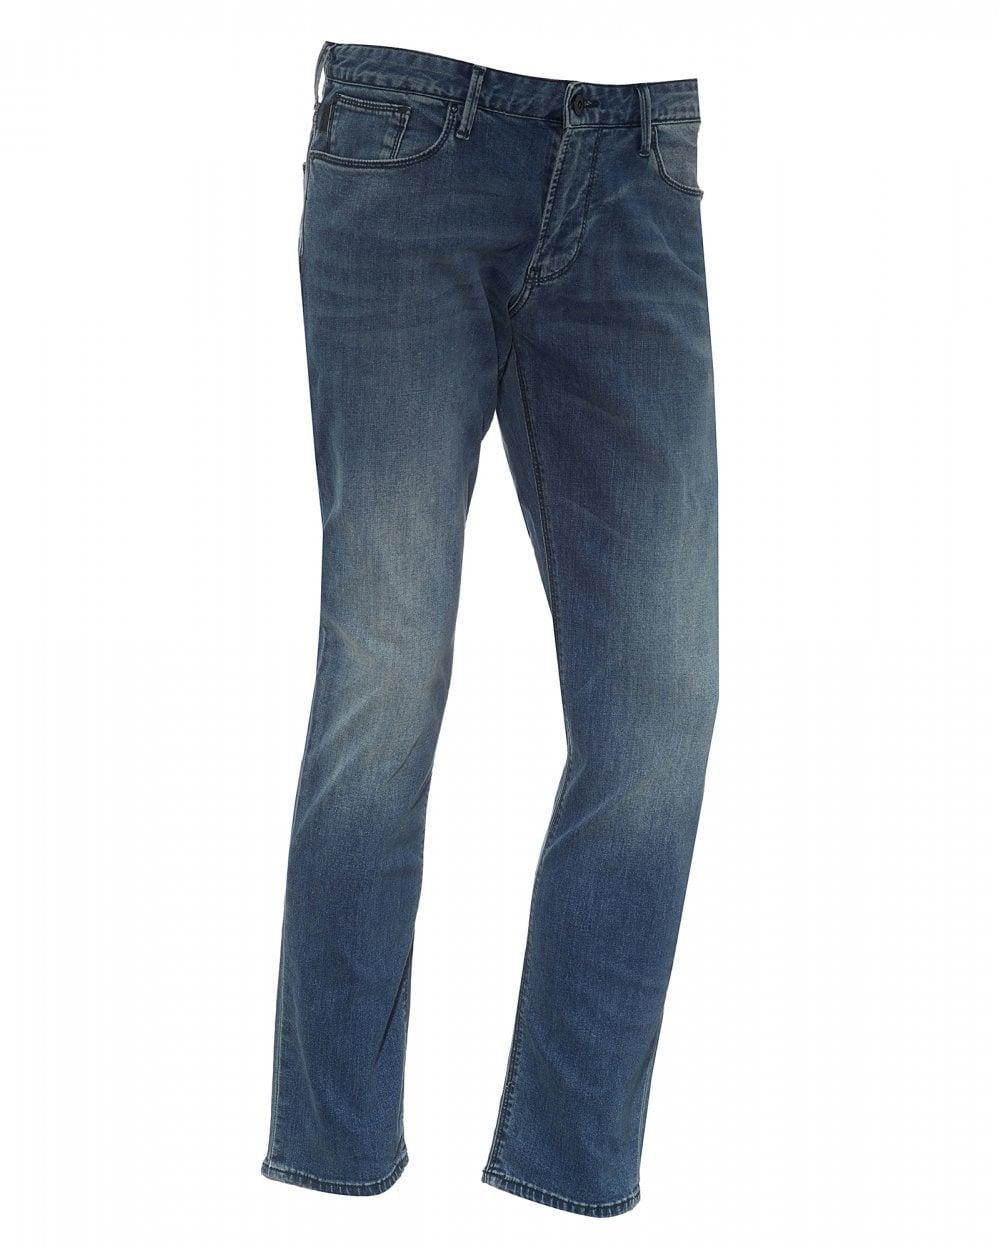 e5408b39 Mens J06 Light Blue Denim, Slim Fit Jeans